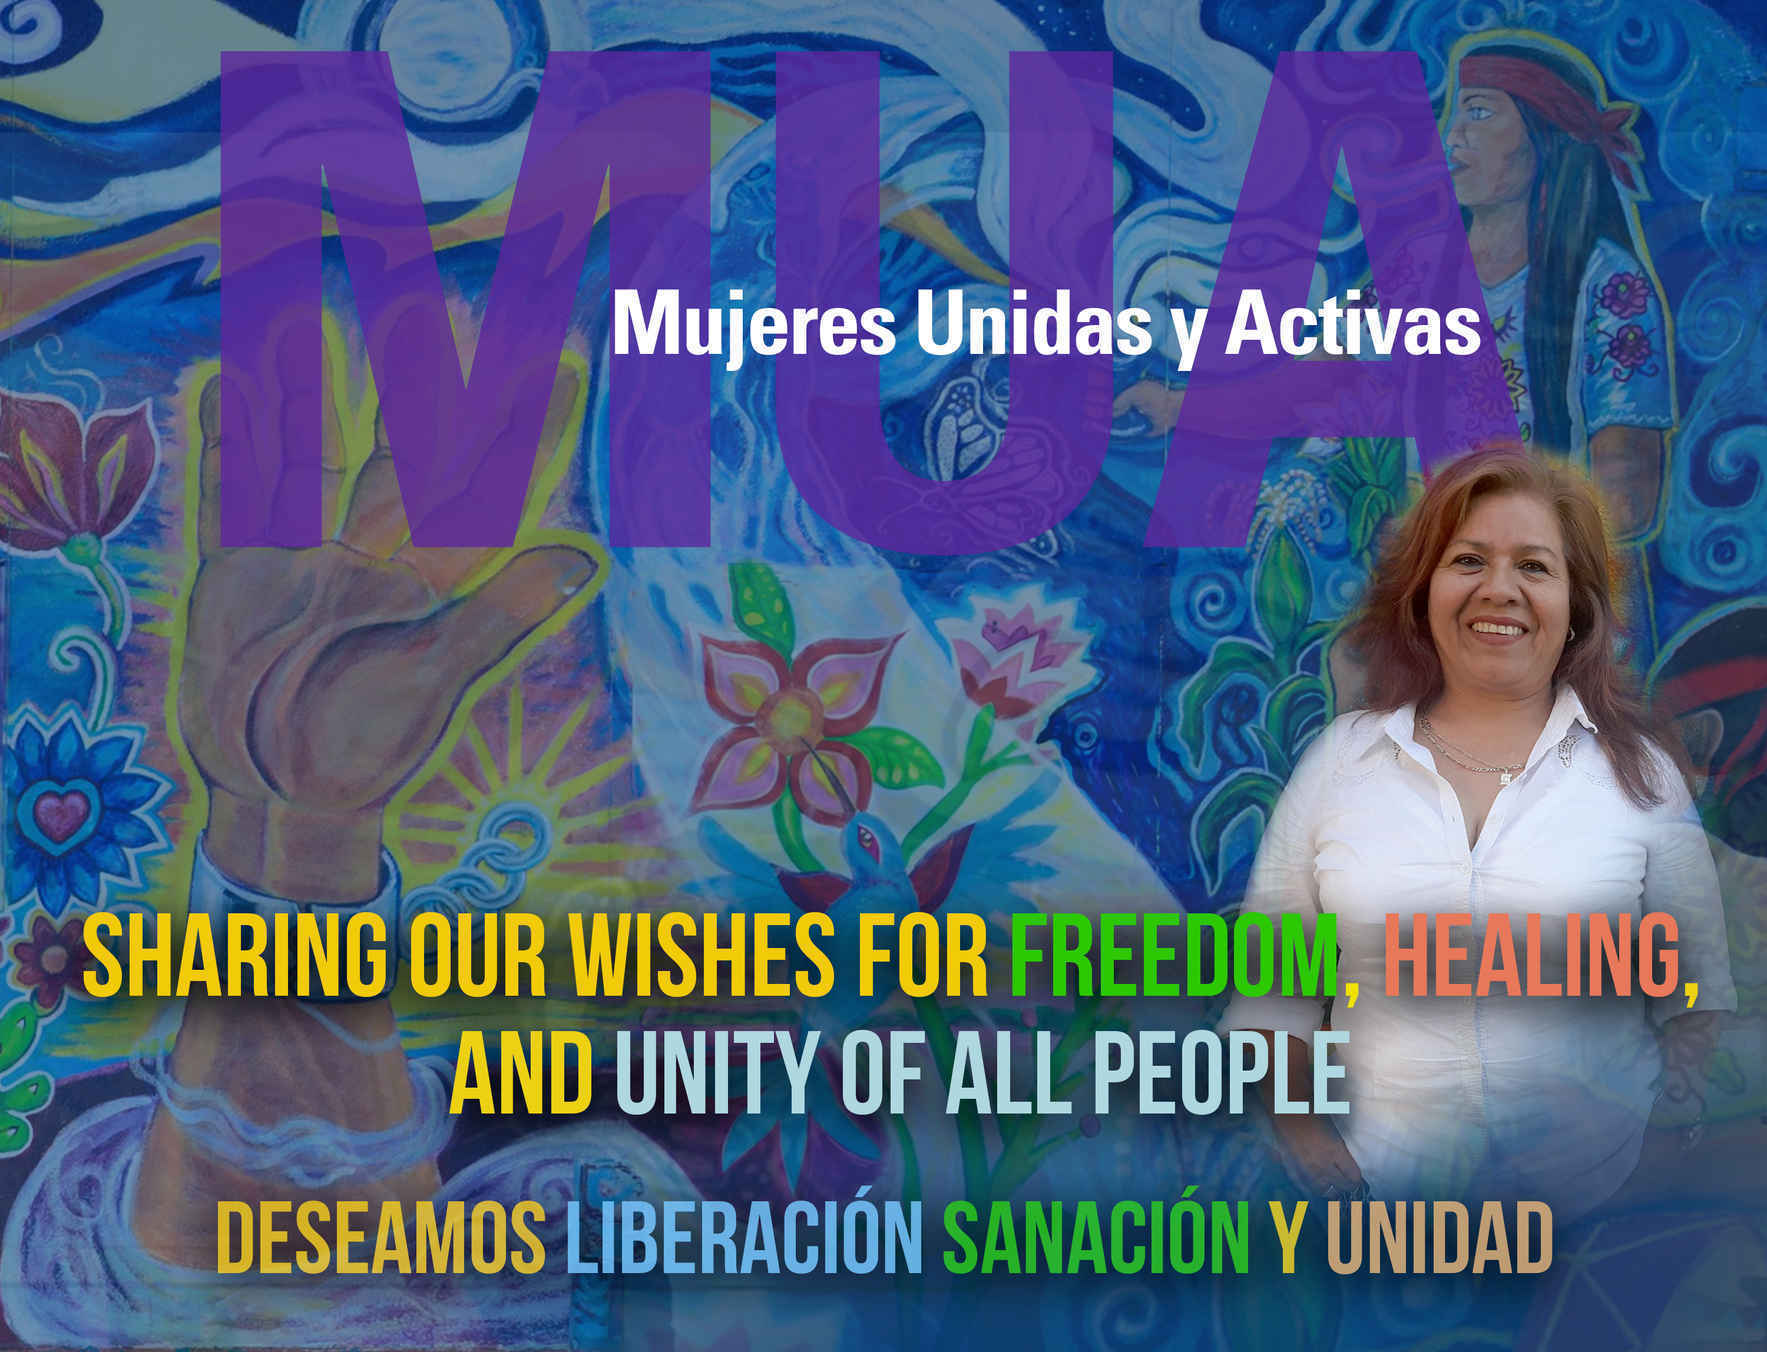 Support us to prepare for our 30th Aniversary! - Apoyanos a preparar nuestro 30 Aniversario! image